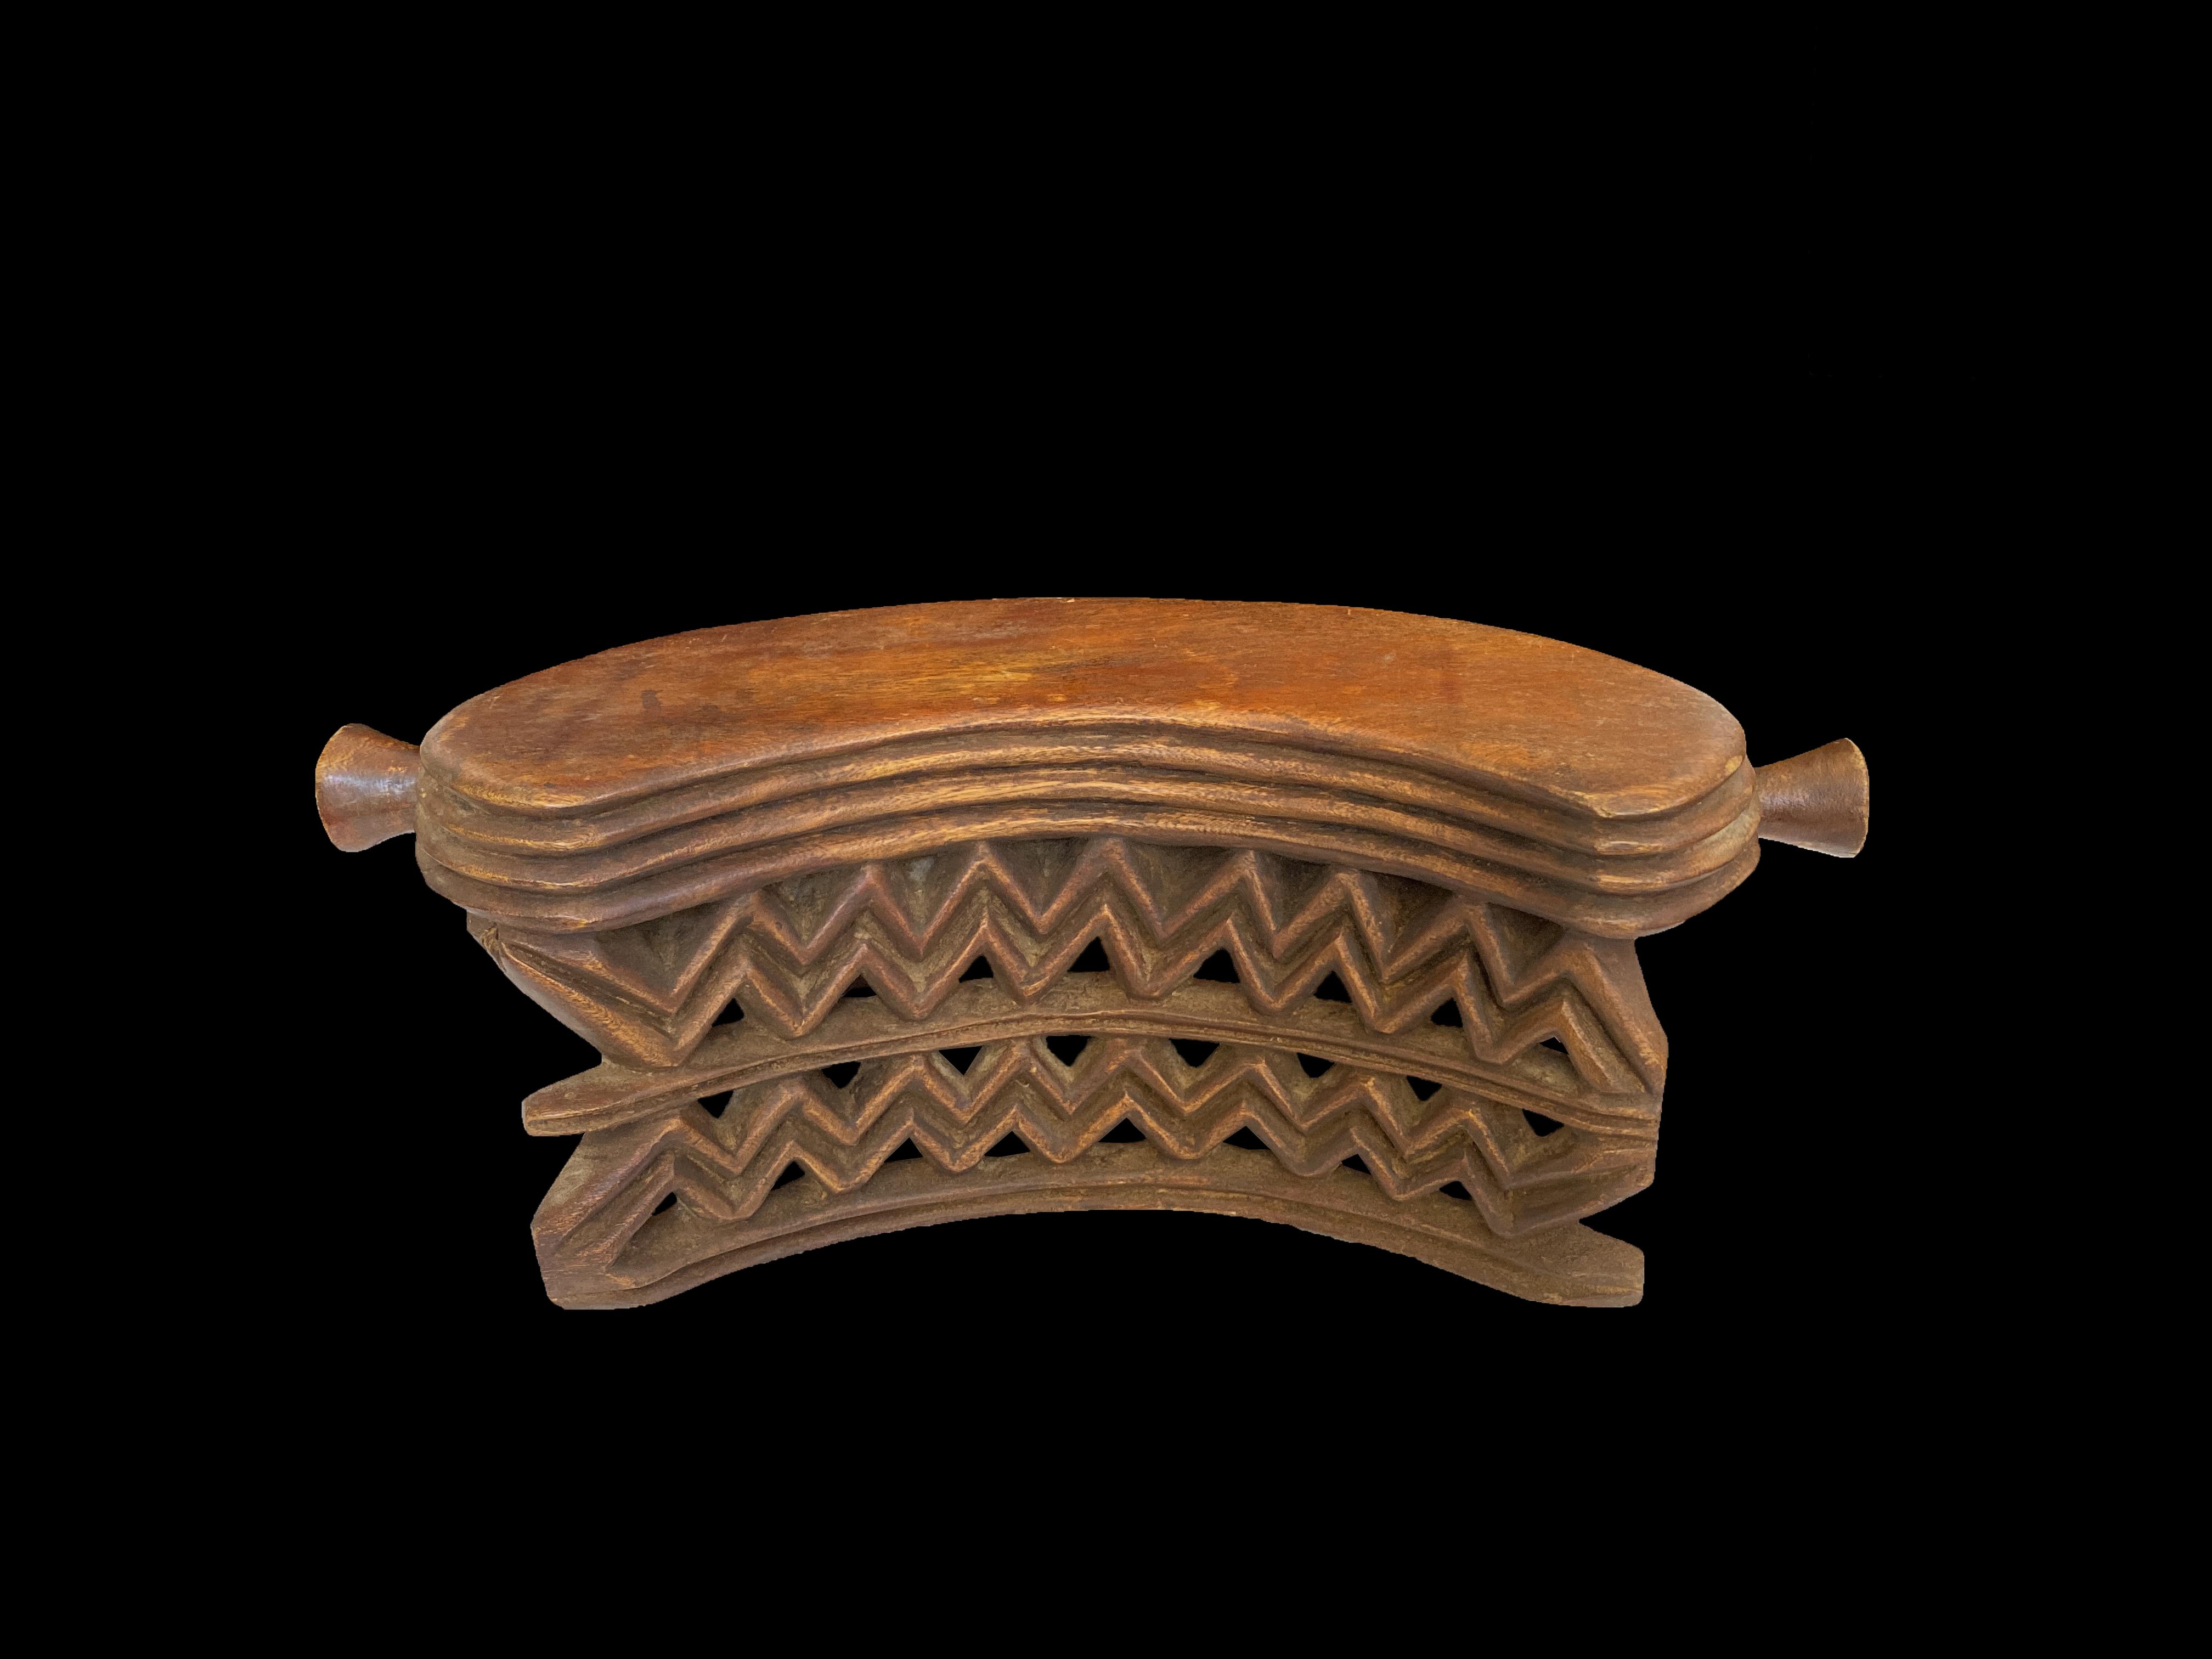 Wooden Stool/Headrest - Dinka People, South Sudan